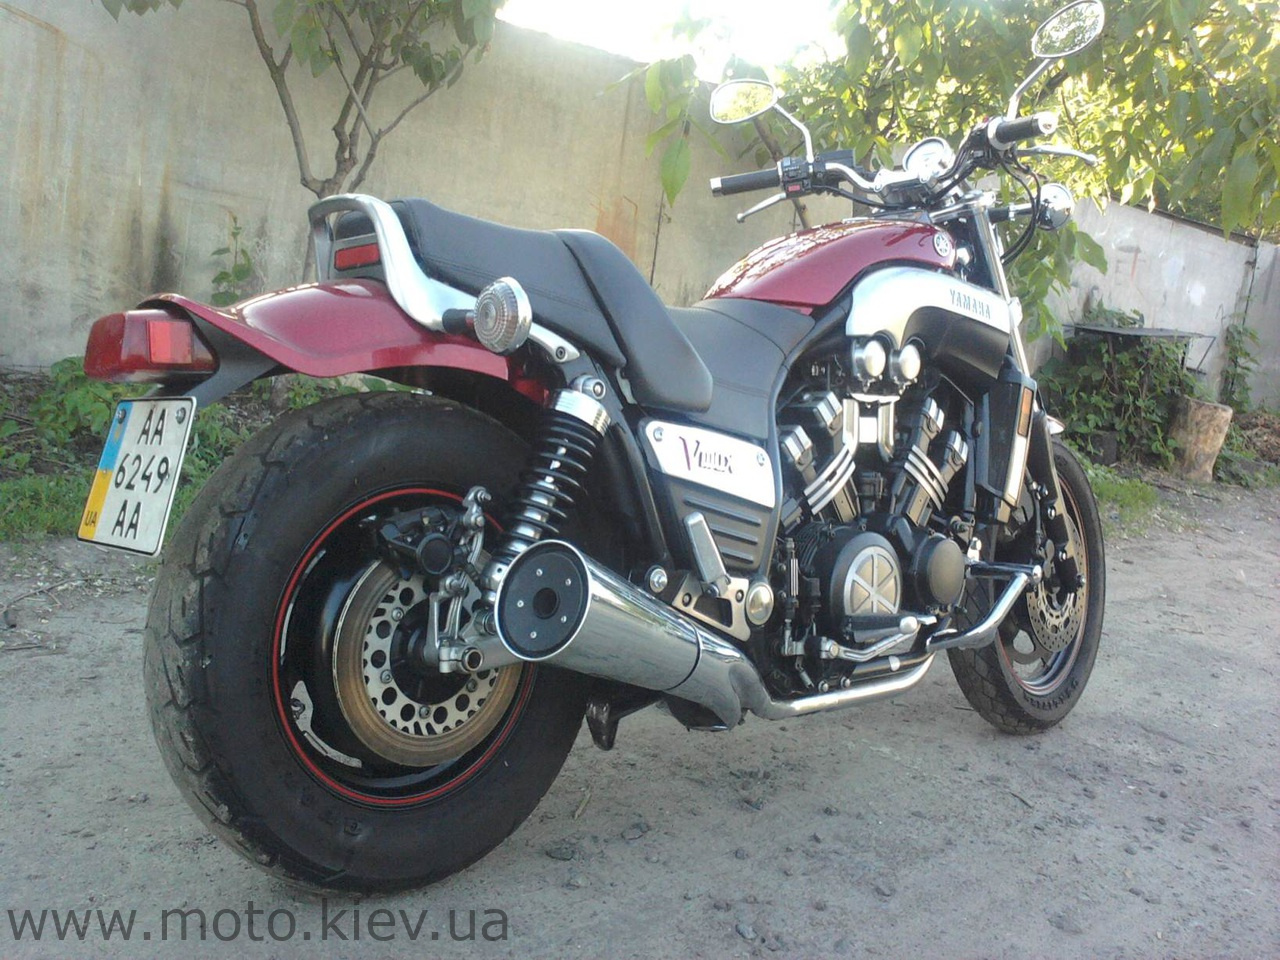 Тюнинг мотоциклов ямаха 5